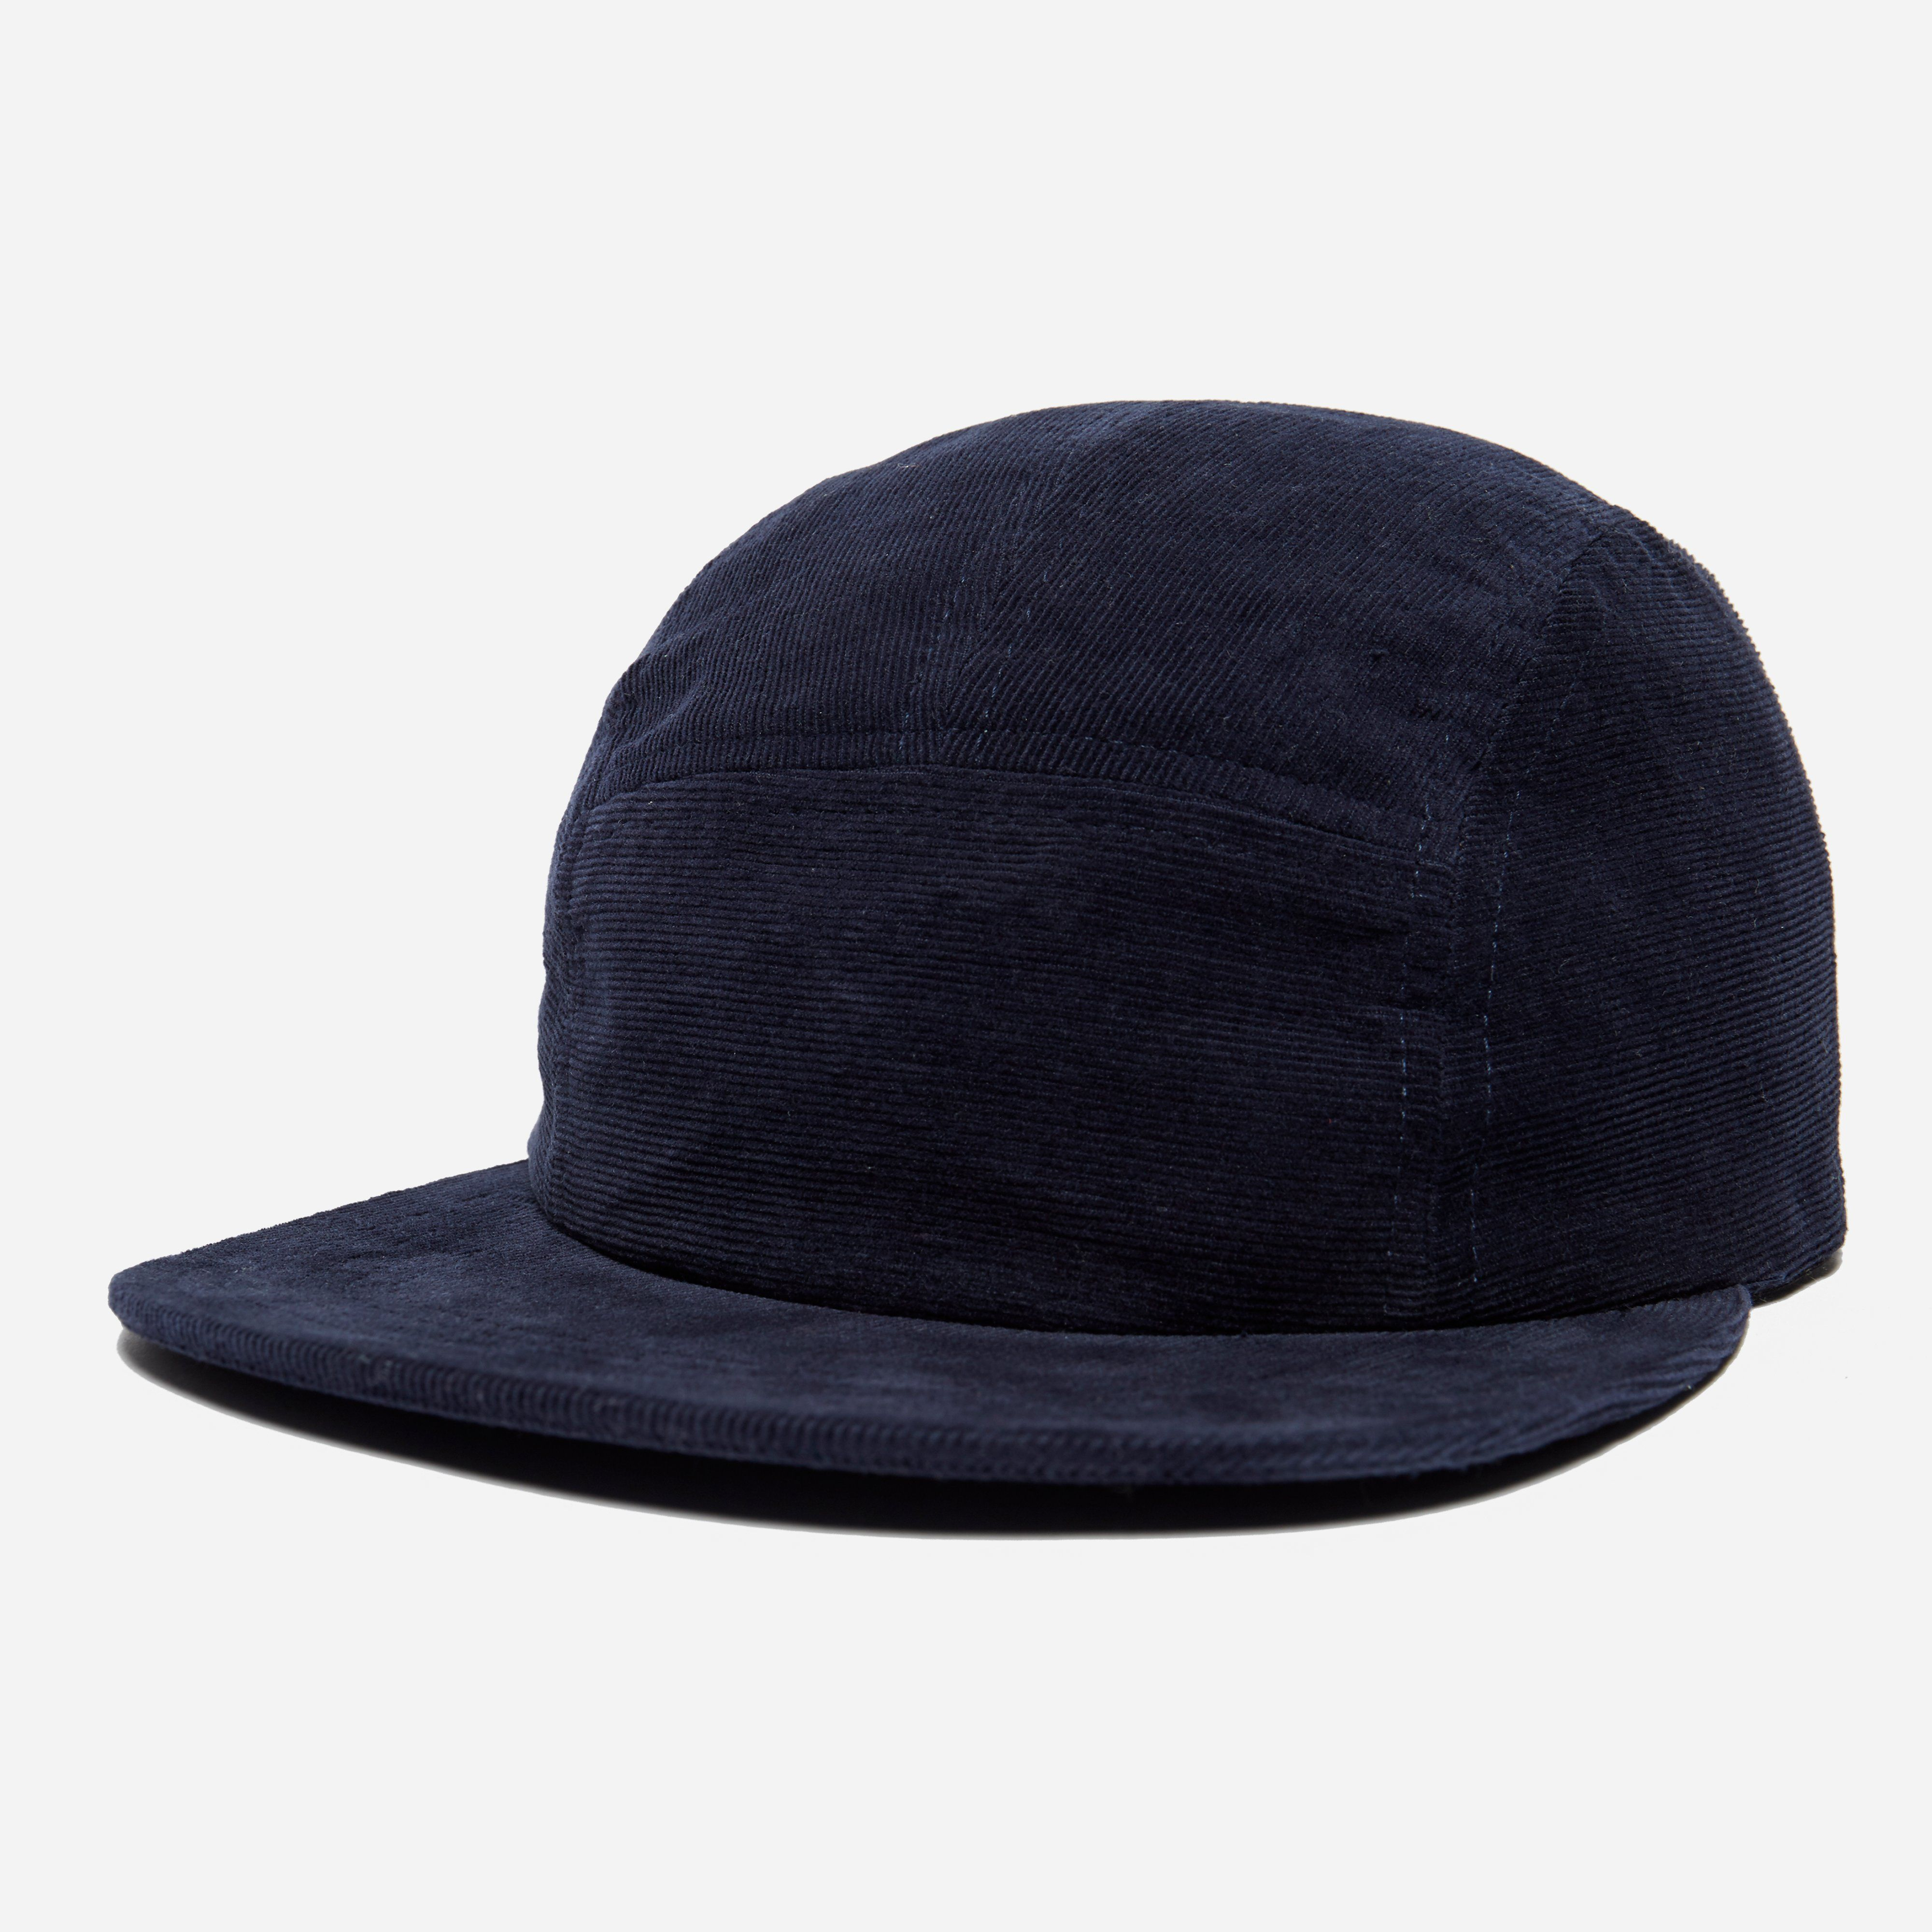 Les Basics Le Peak Corduroy Cap